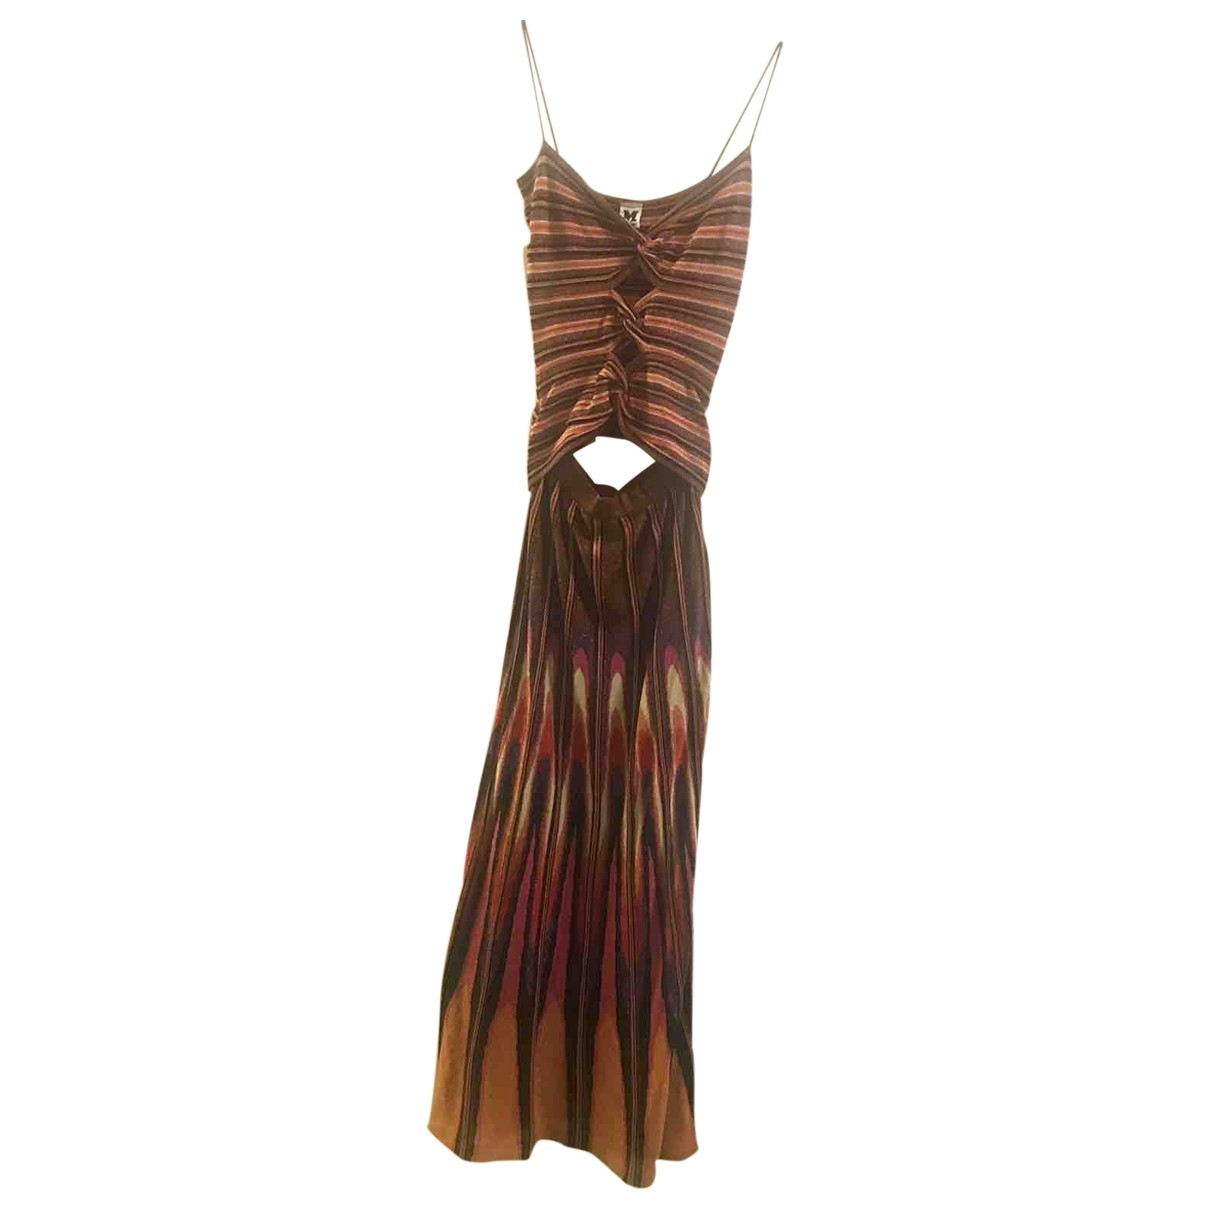 M Missoni \N Multicolour dress for Women 42 IT